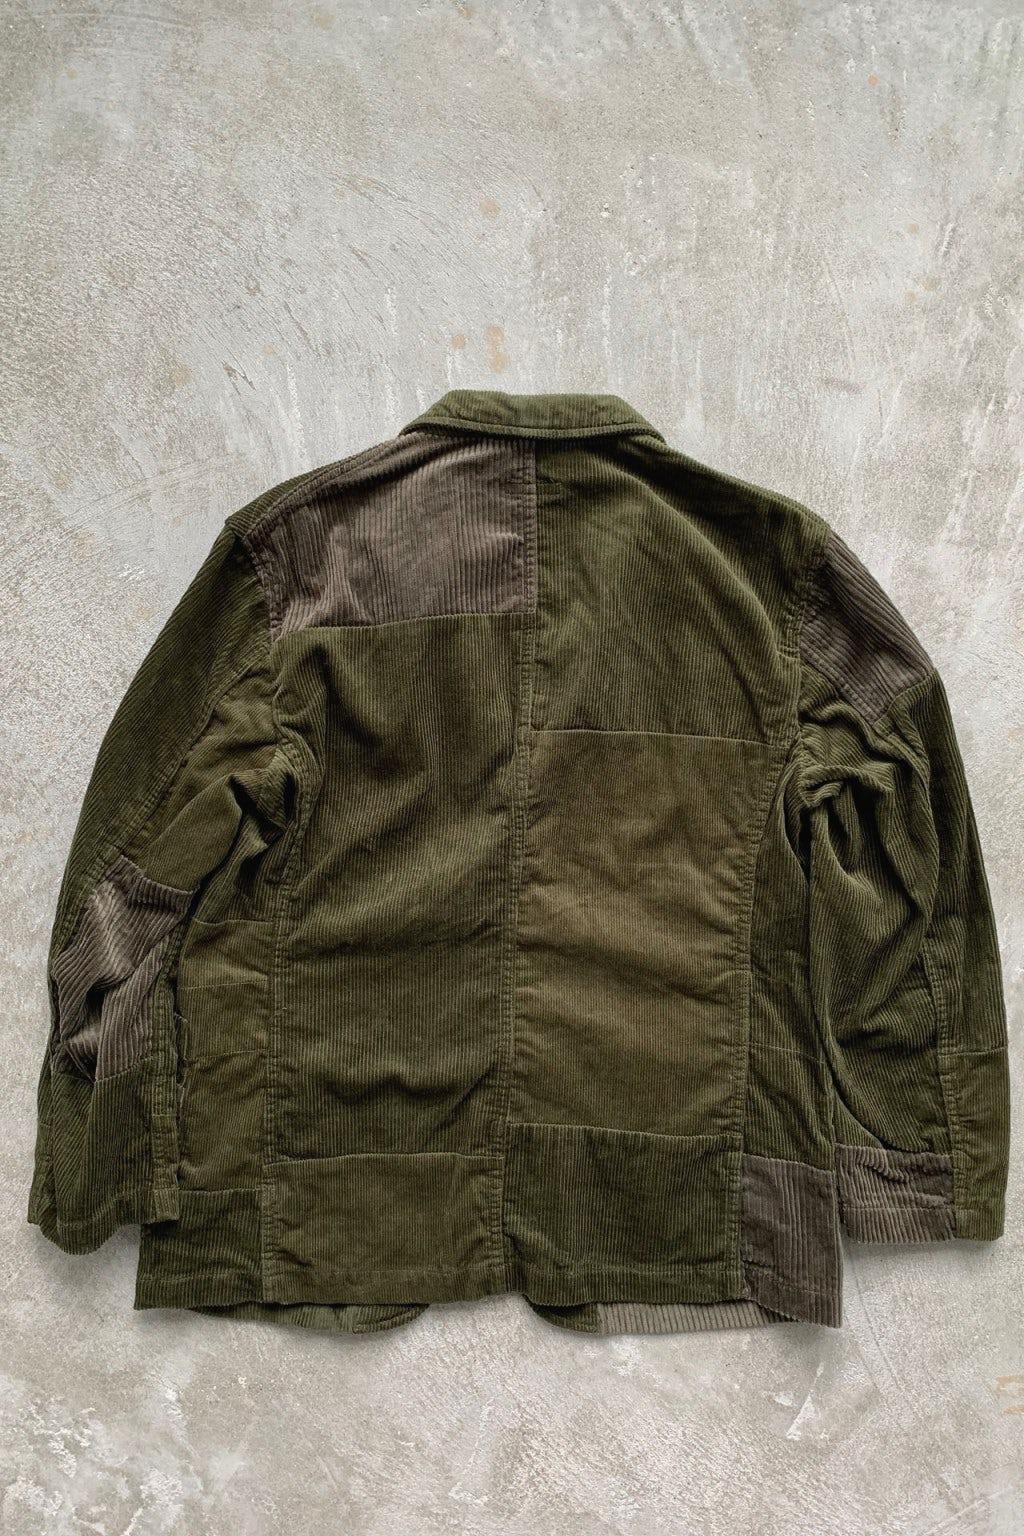 Engineered Garments Bedford Jacket Olive 8W